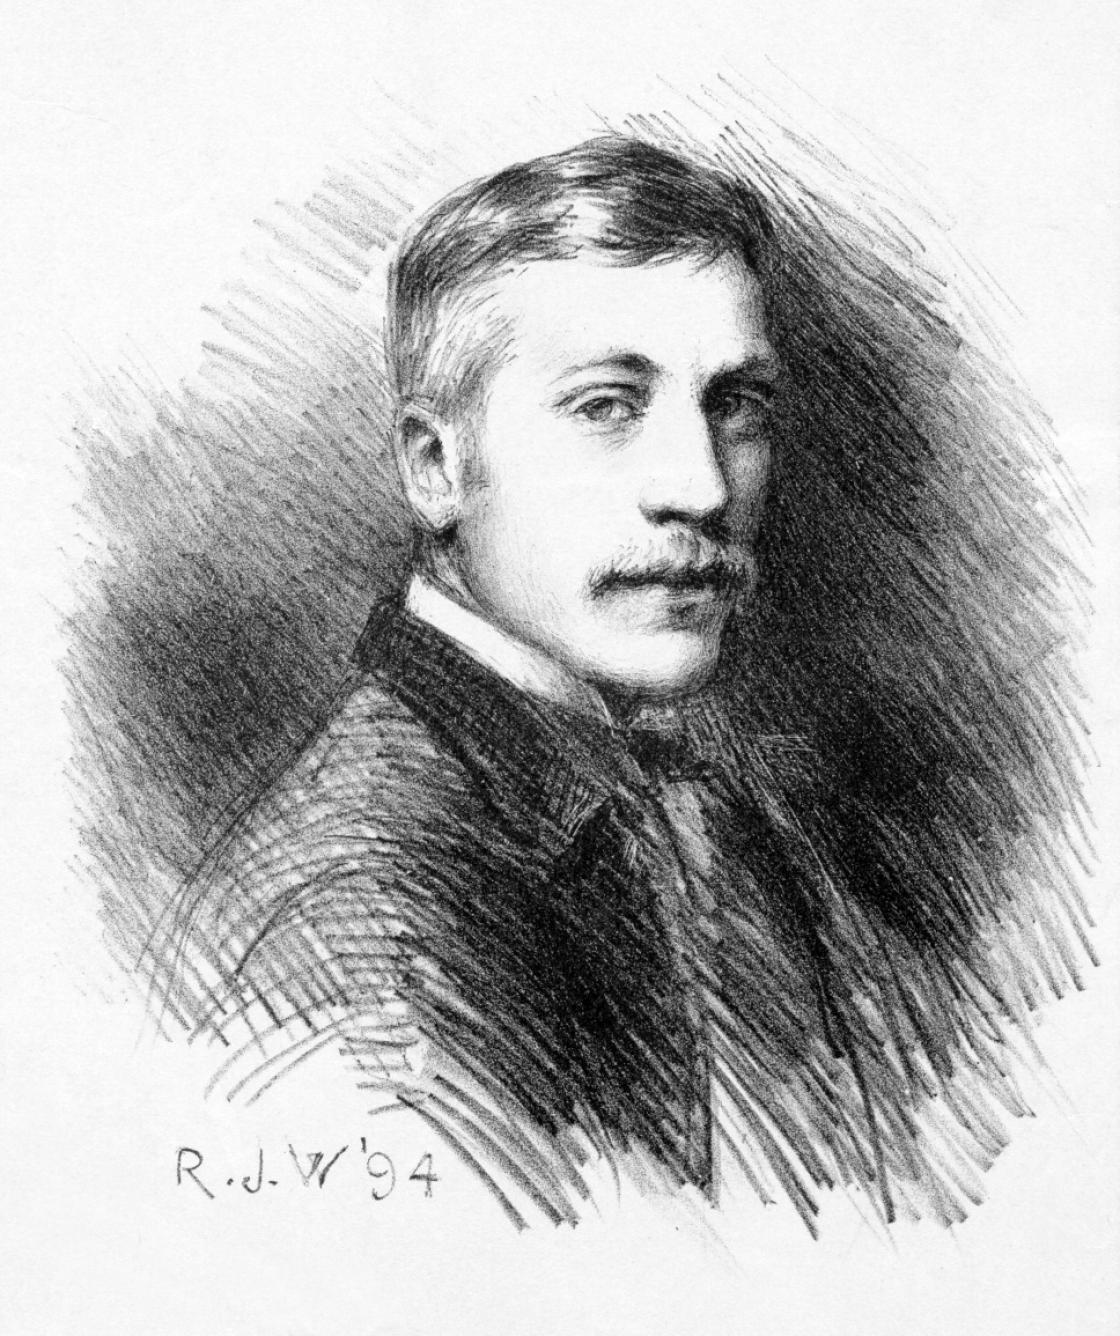 Robert J. Wickenden, Self Portrait, 1894, lithograph (18 x 16 cm). Private Collection, Montréal, Canada. Photography Courtesy Ken Watson.